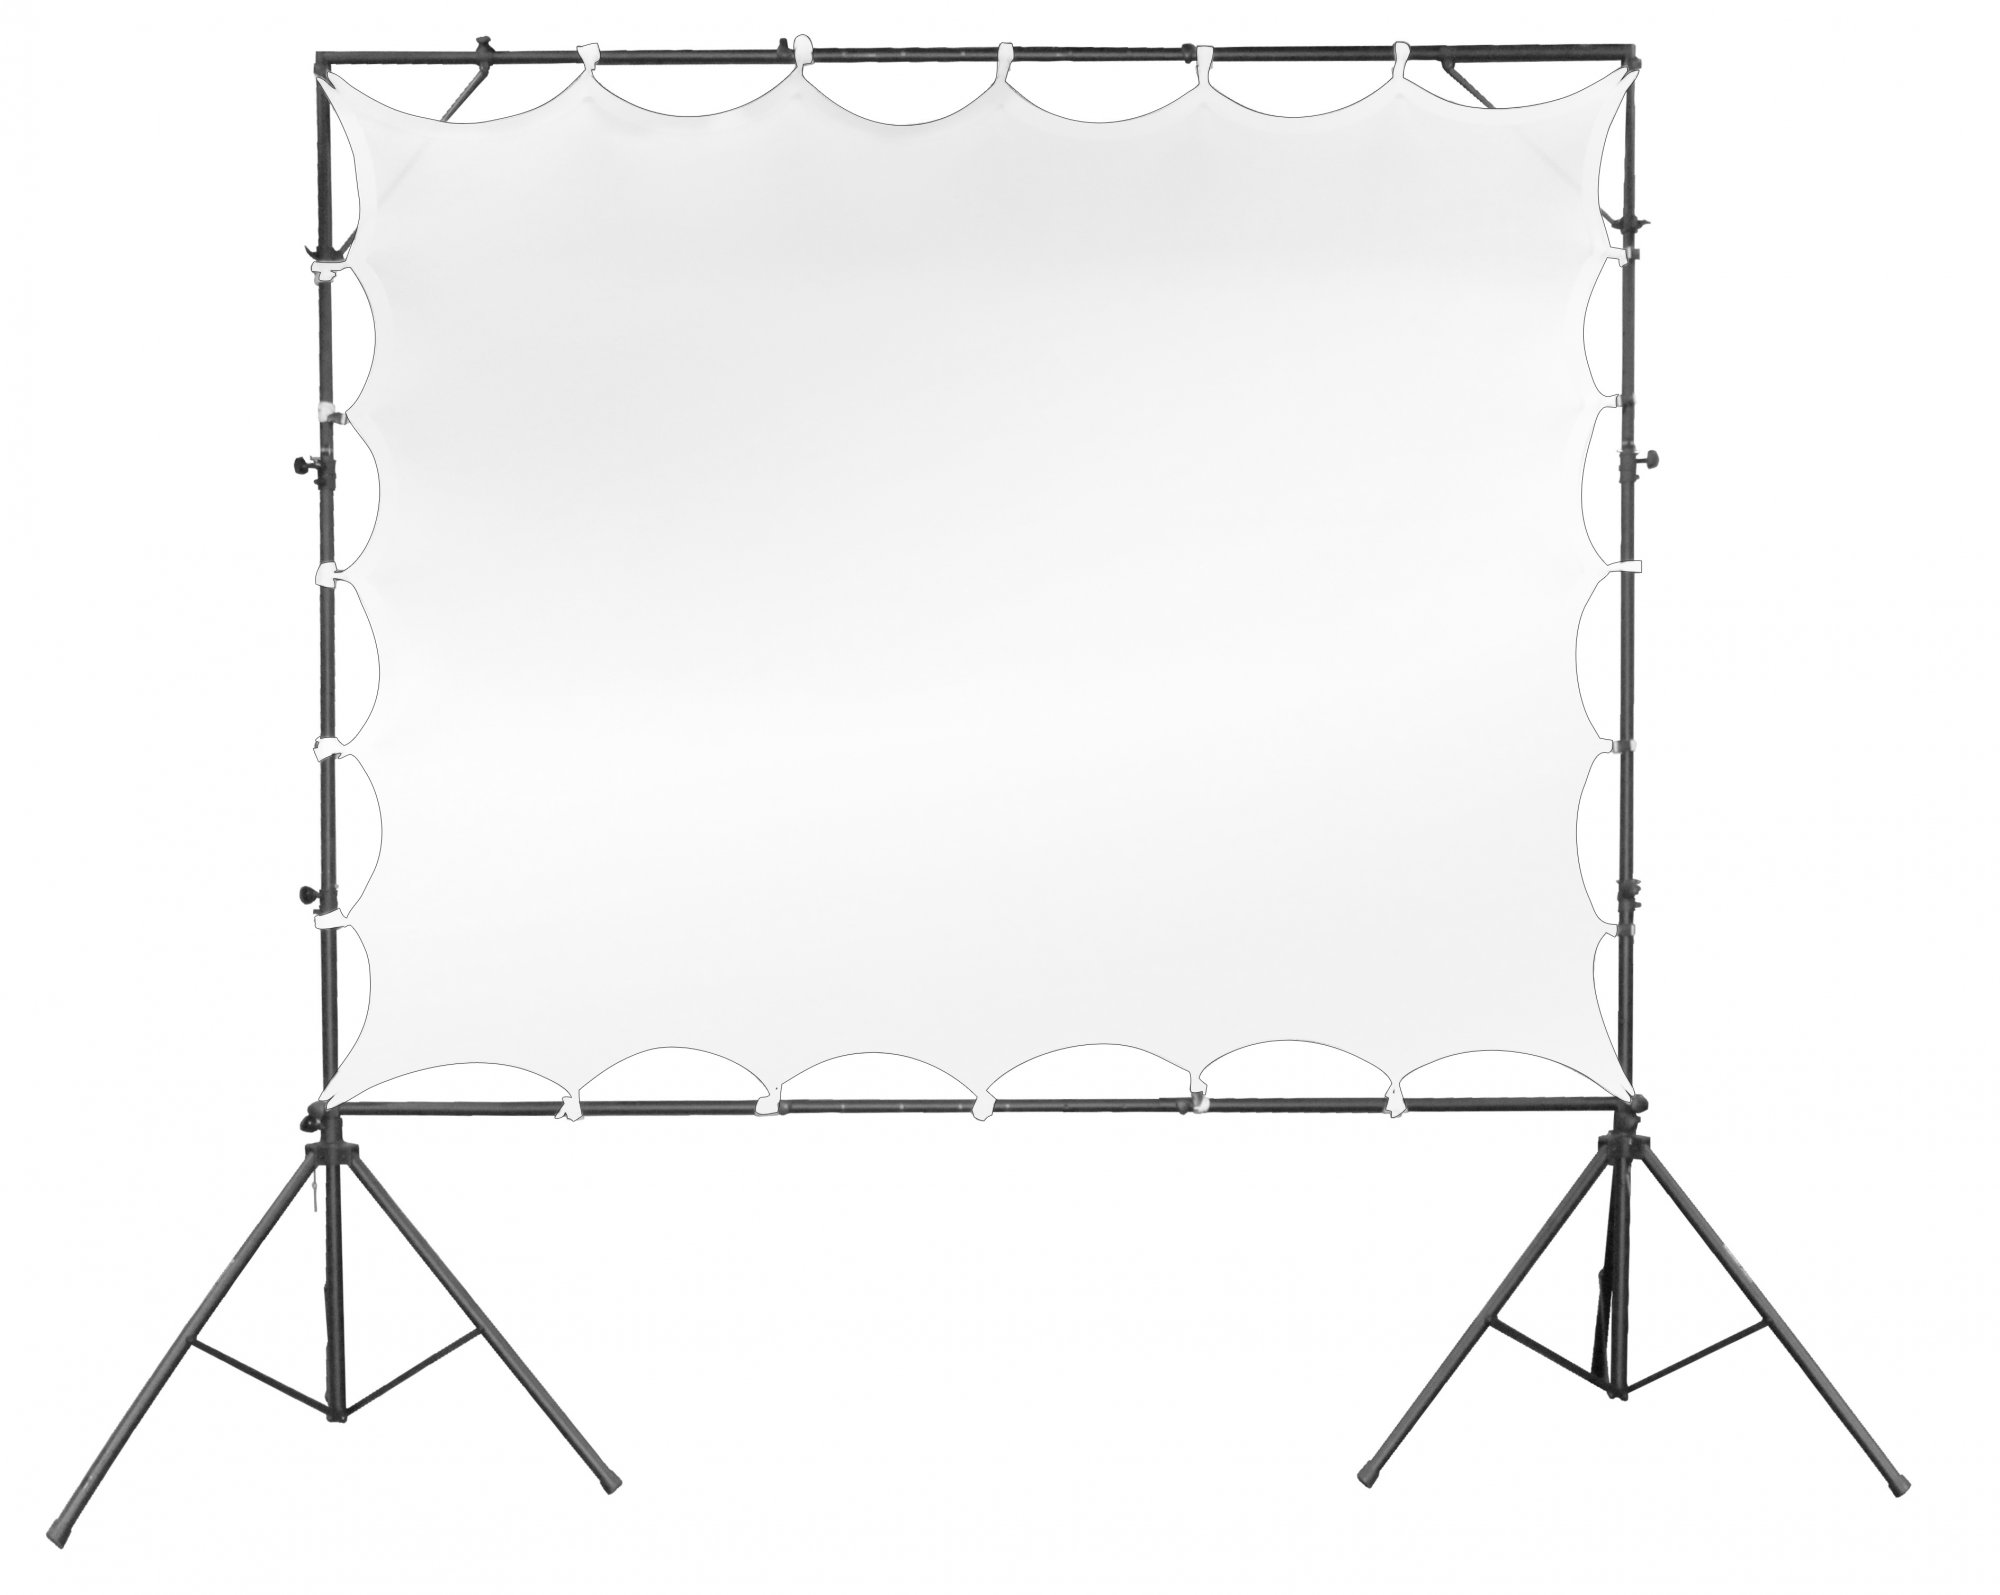 Odyssey Case LTMVSCREEN3 - Video Projection Screen, 7.5' x 5'